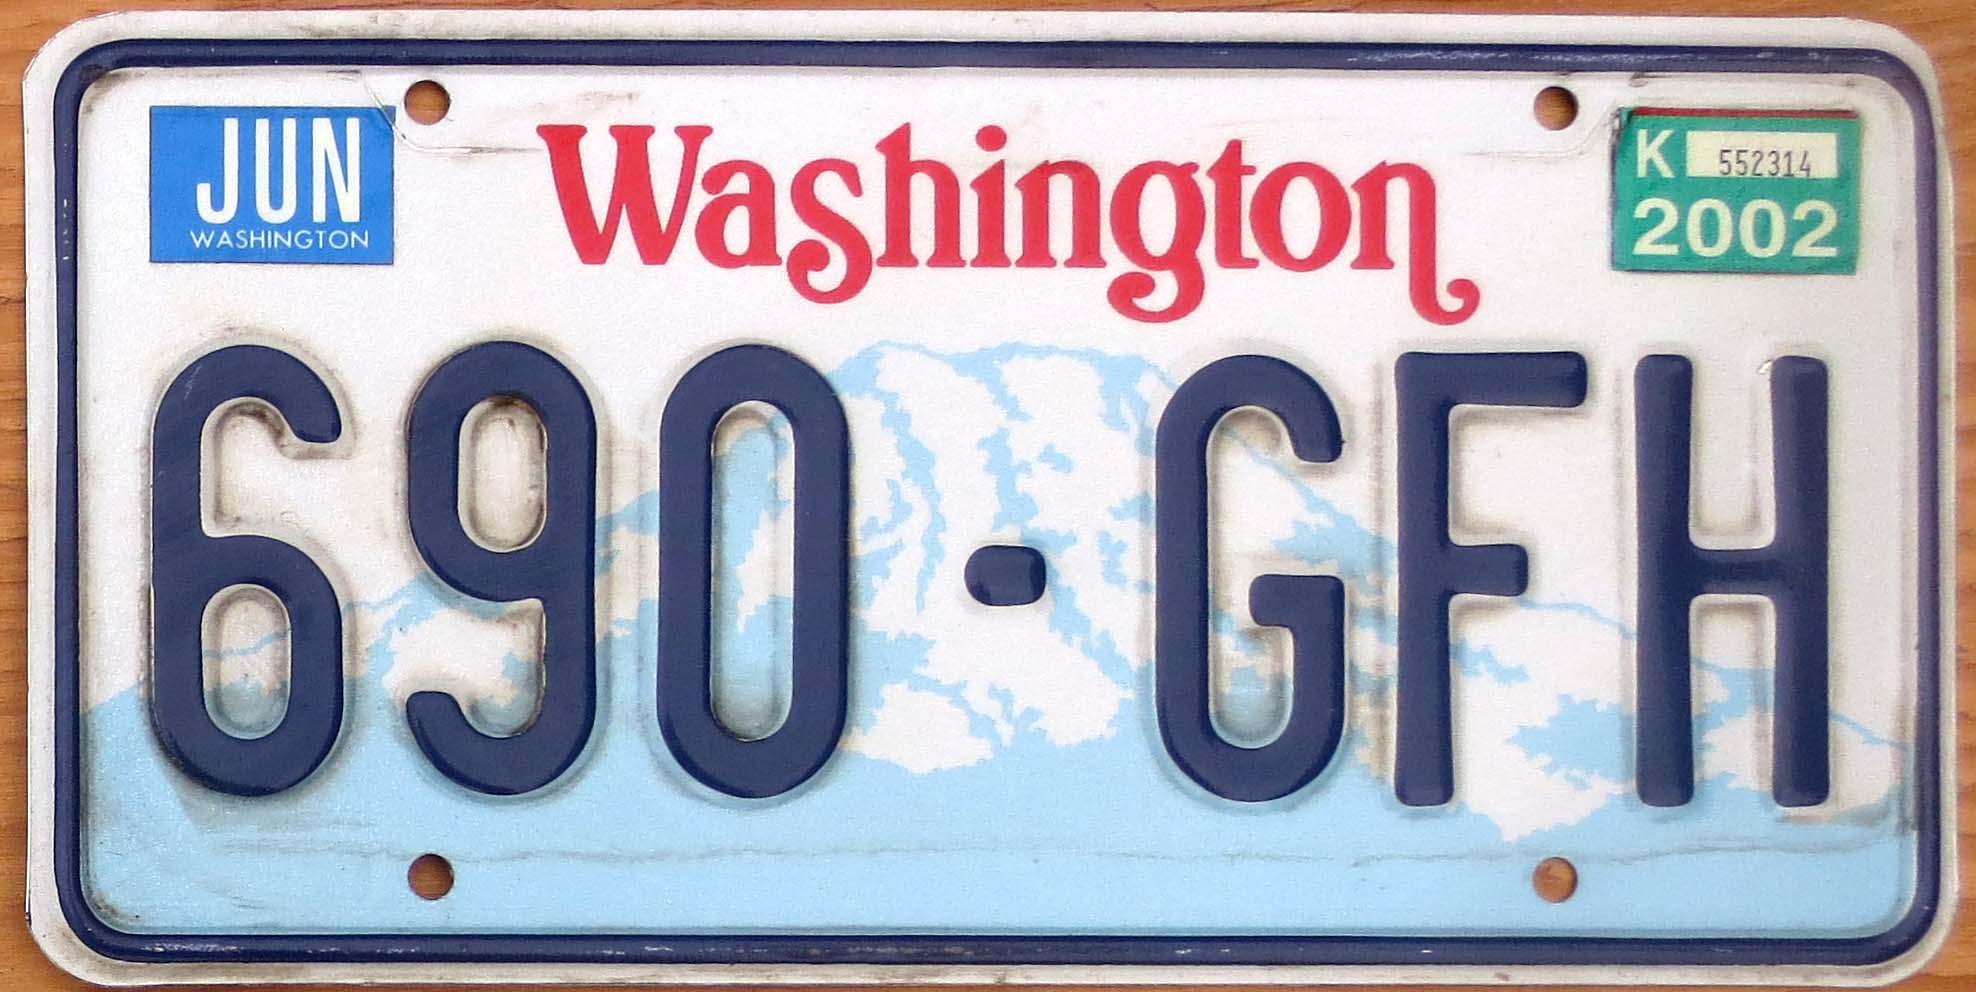 2002 Washington Vg Automobile License Plate Store